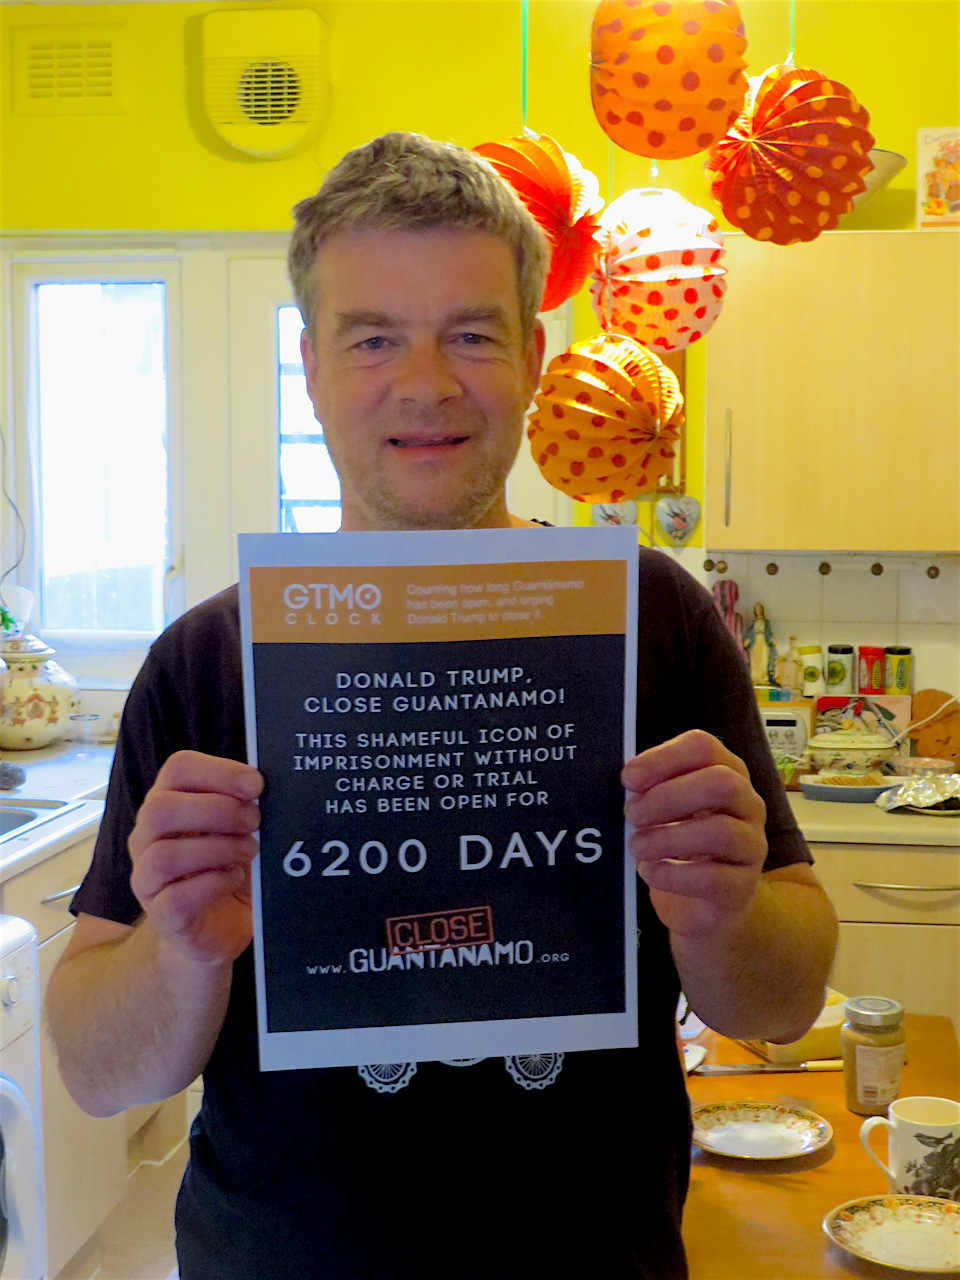 Close Guantanamo co-founder Andy Worthington marks 6,200 days of Guantanamo's existence on January 1, 2019.